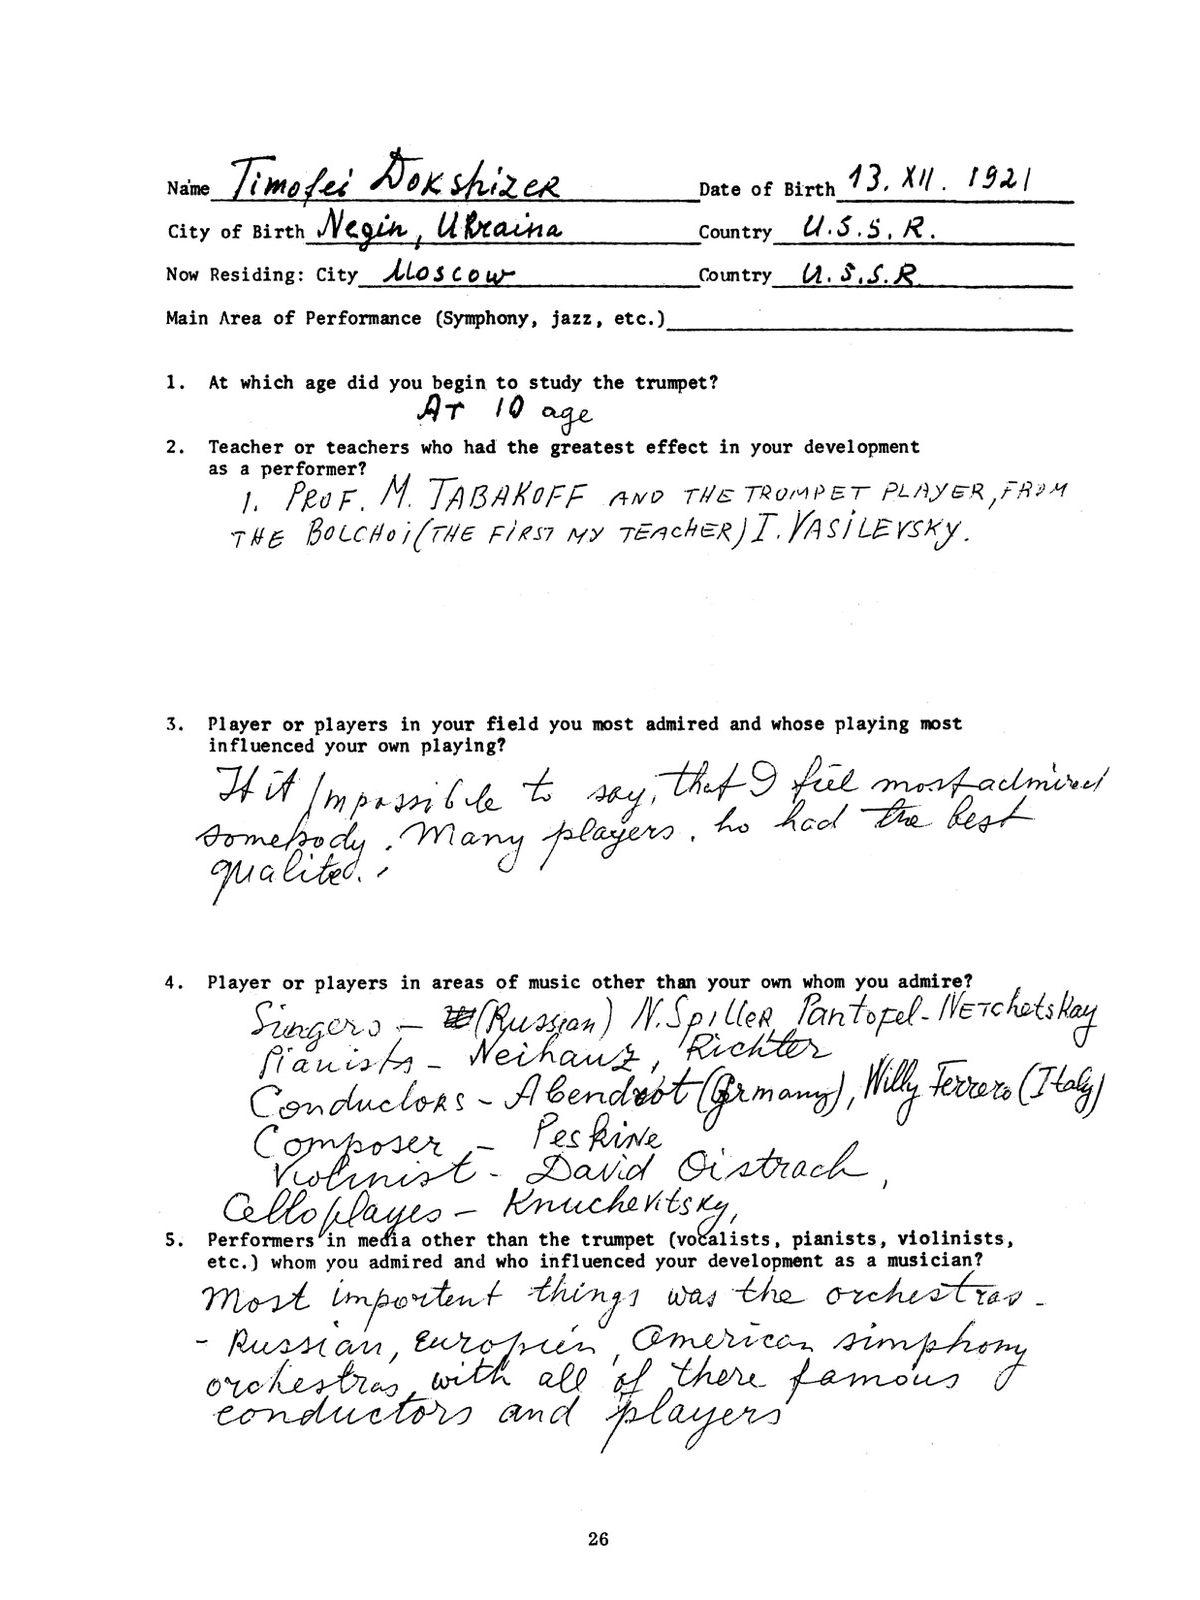 Davidson, Trumpet Profiles-p26